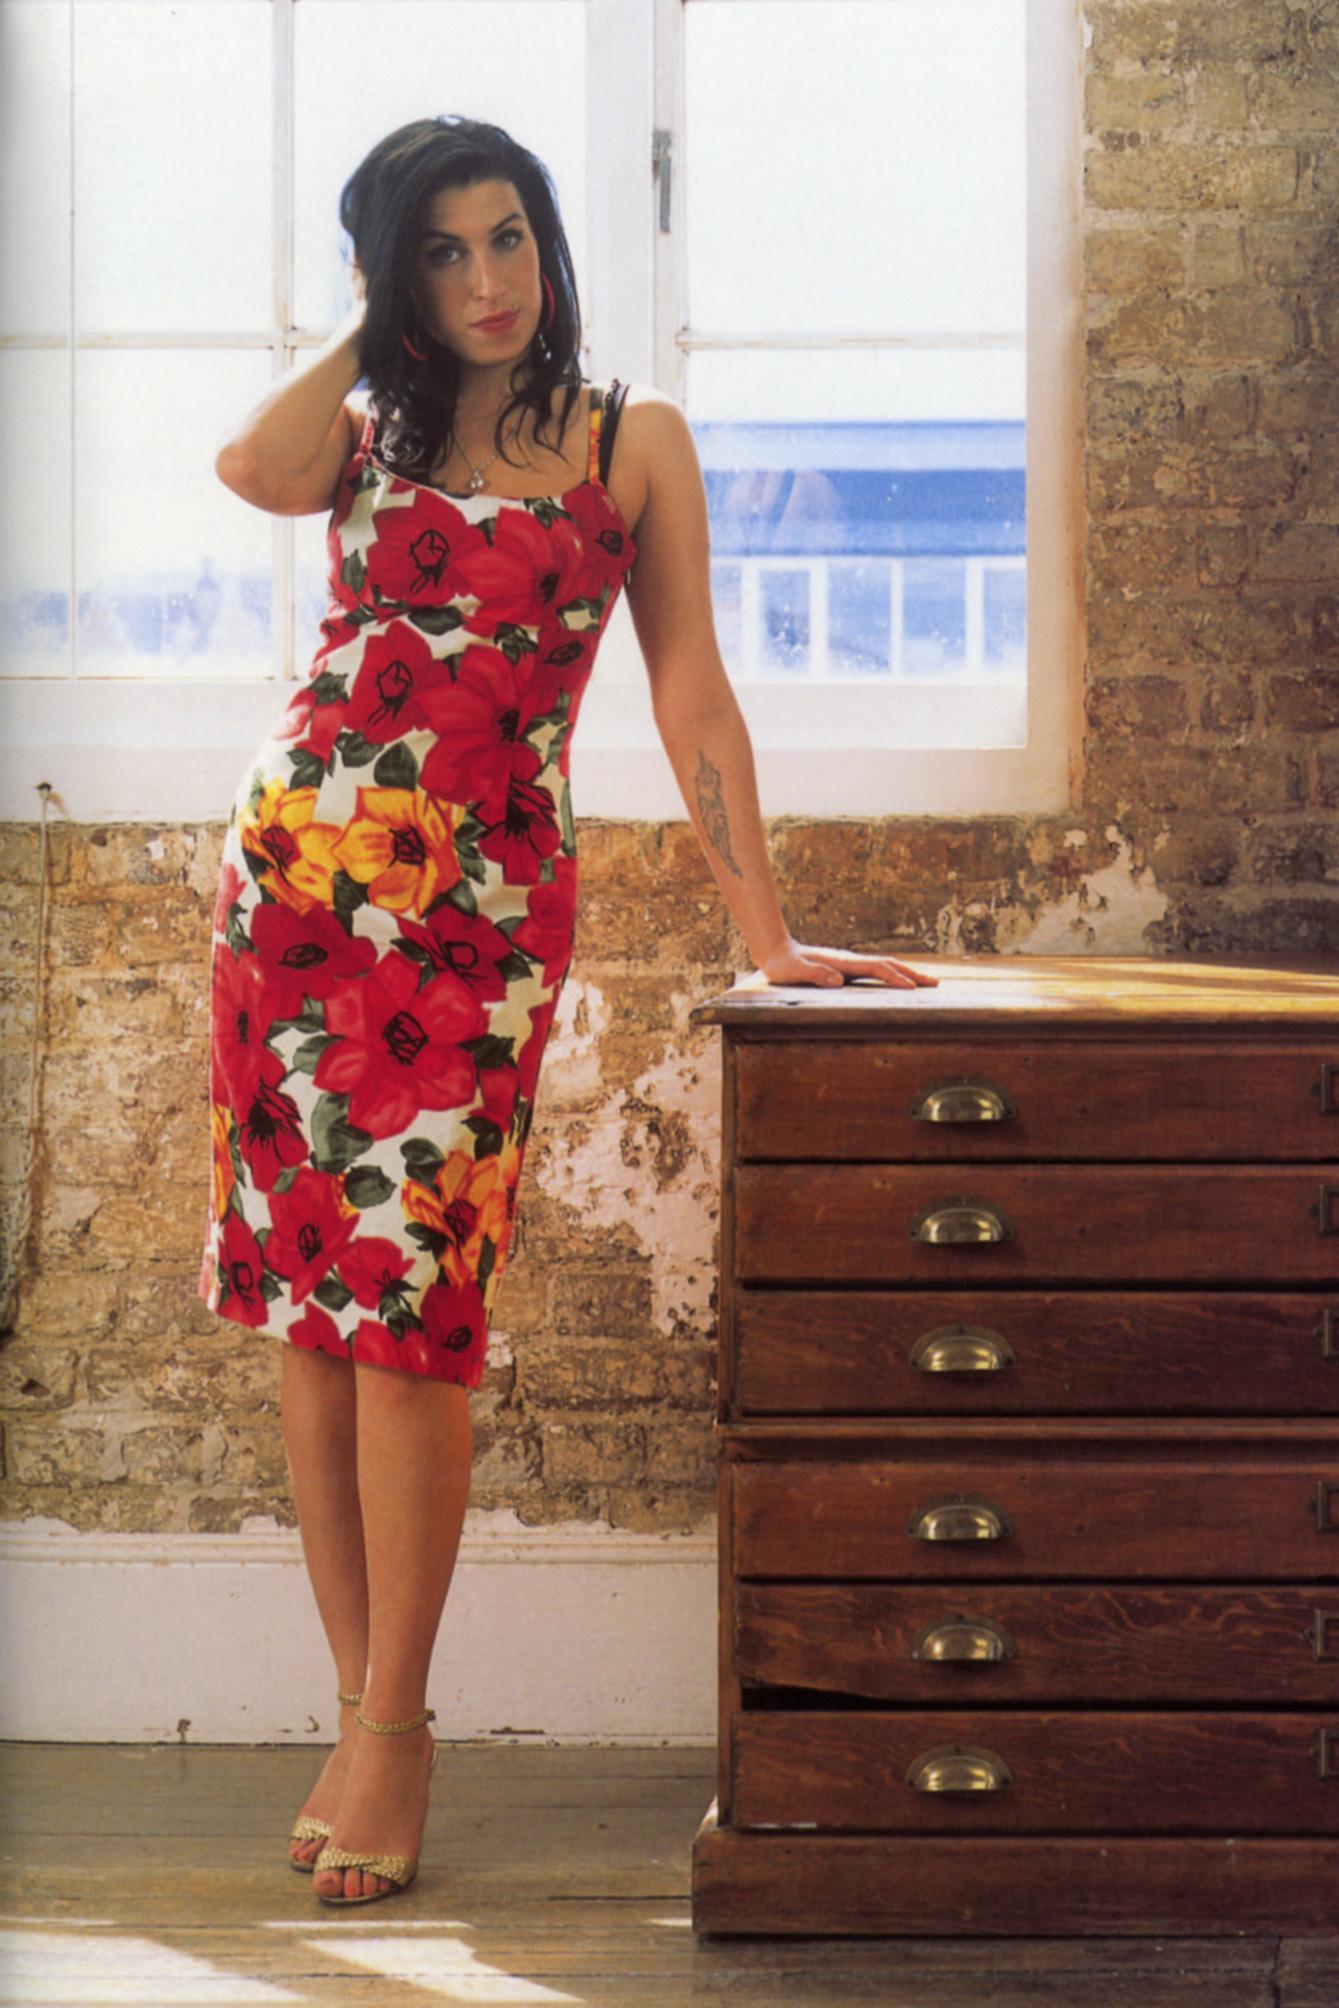 Amy Winehouses Feet